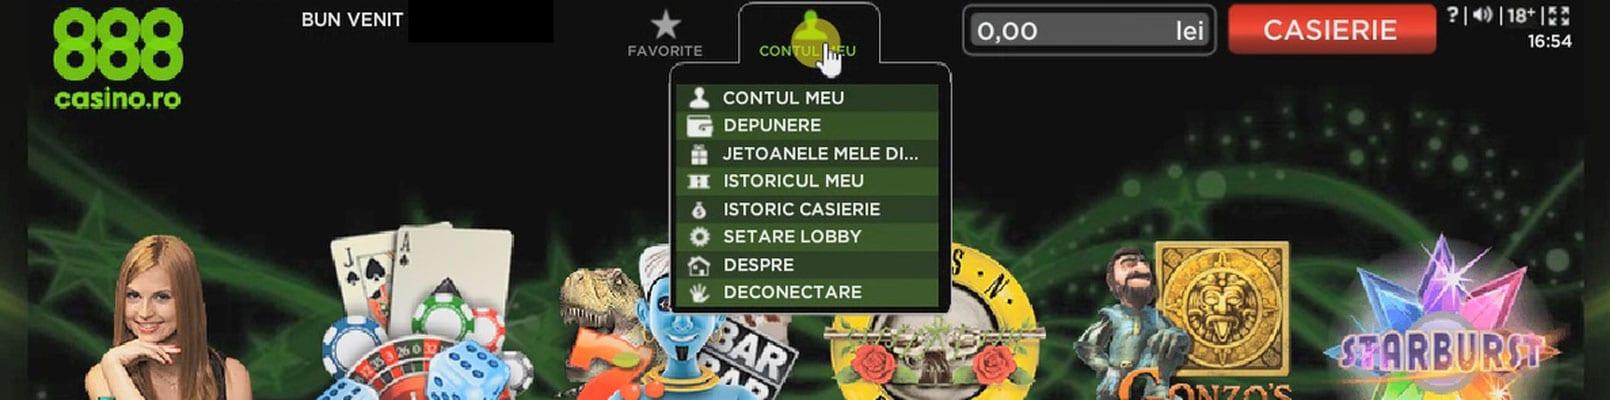 cum faci o depunere 888 casino online